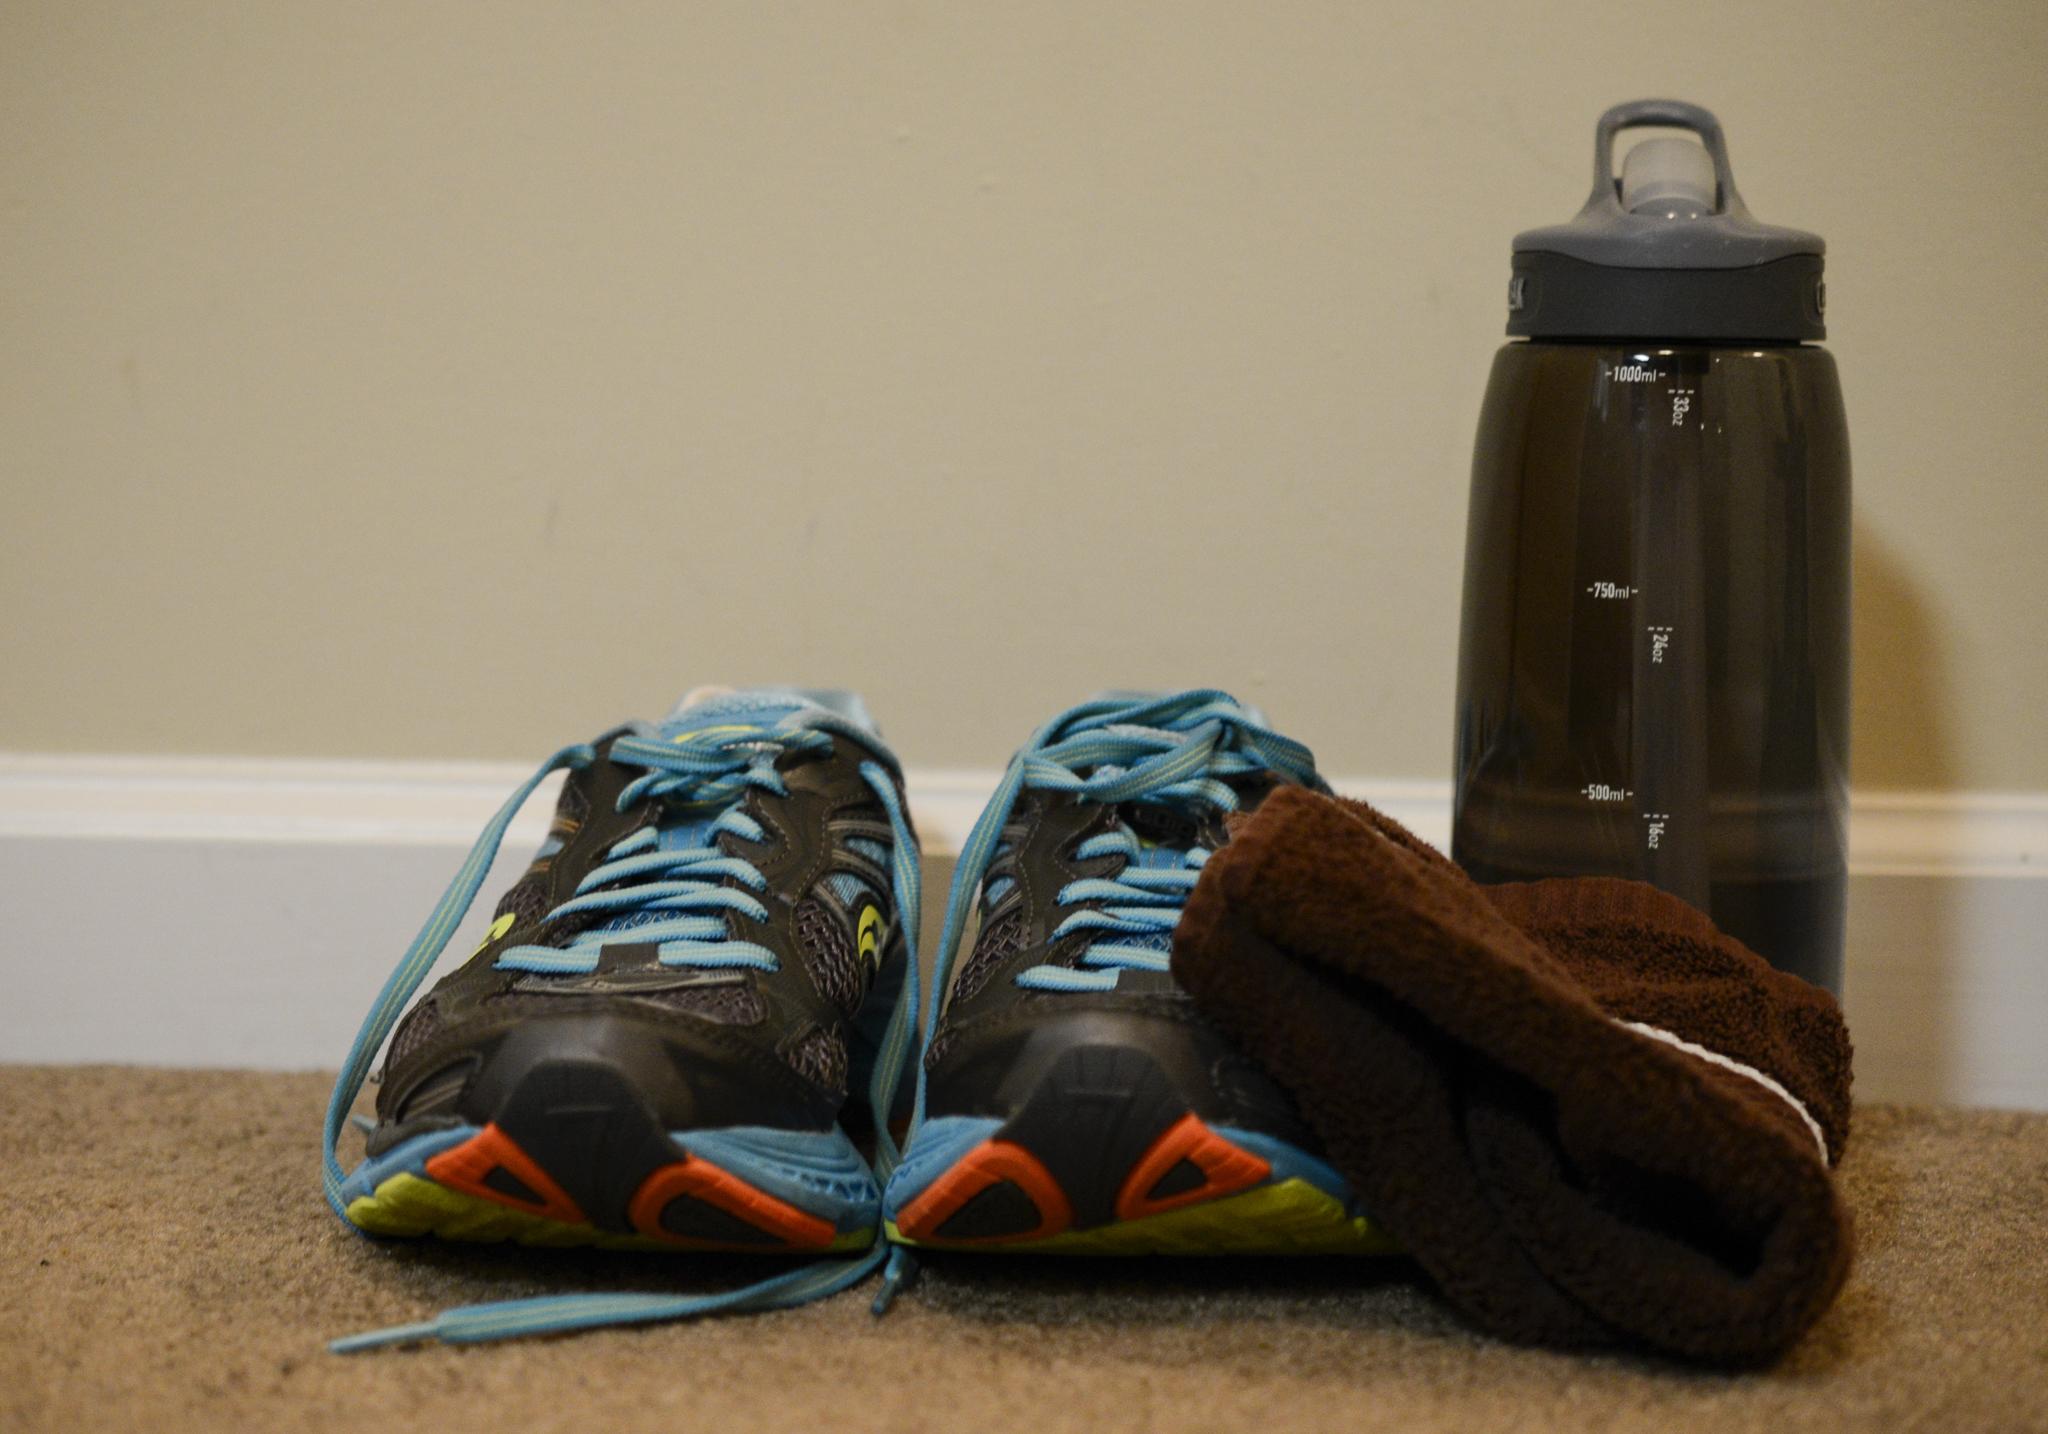 gym/workout gear